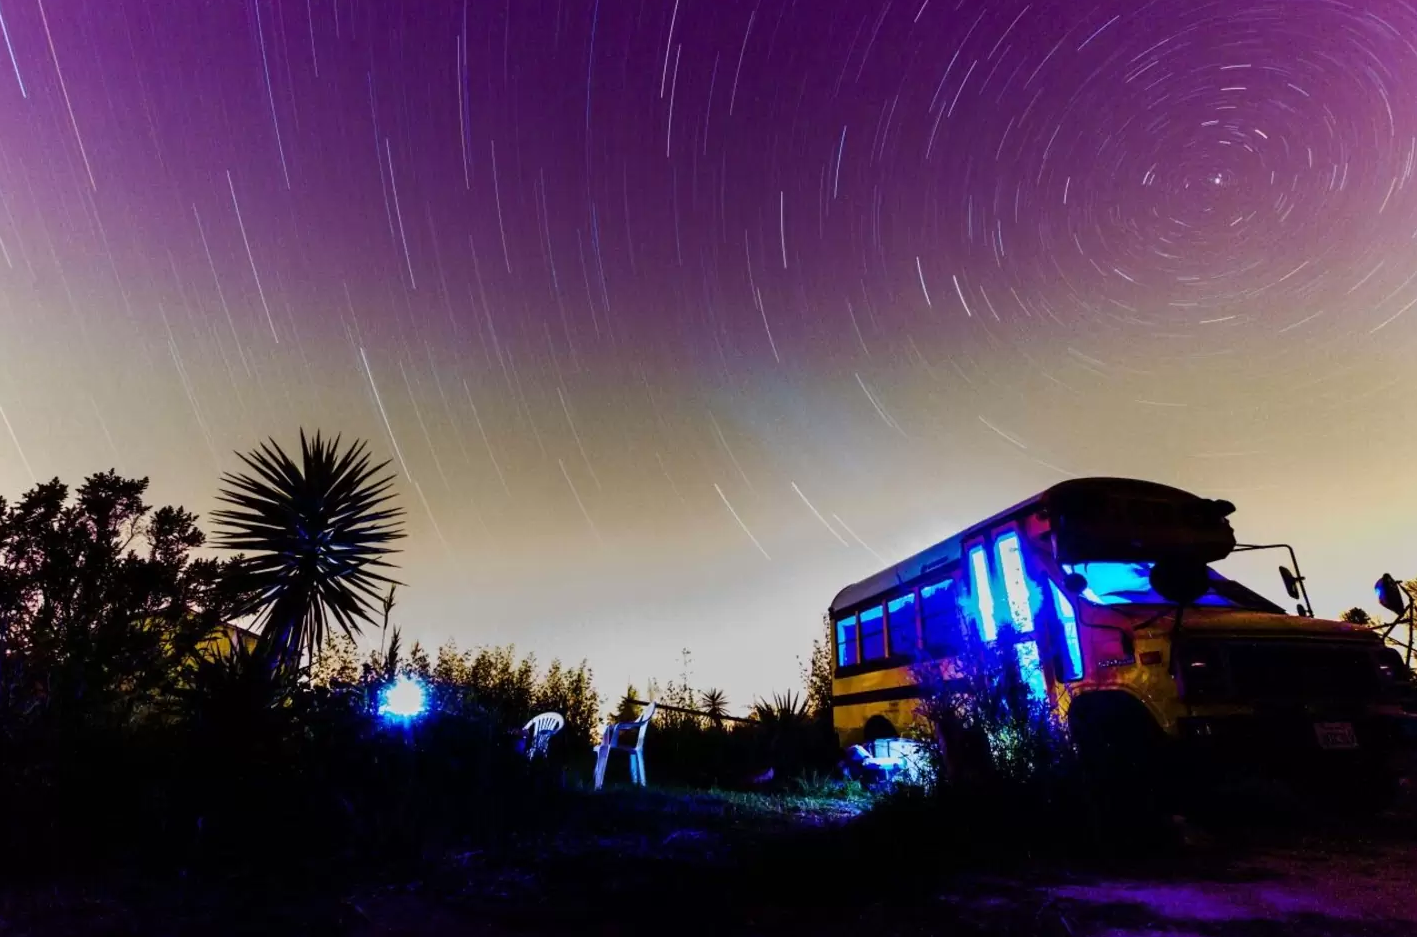 Crazy Airbnb Rentals Weird Vacation Homes